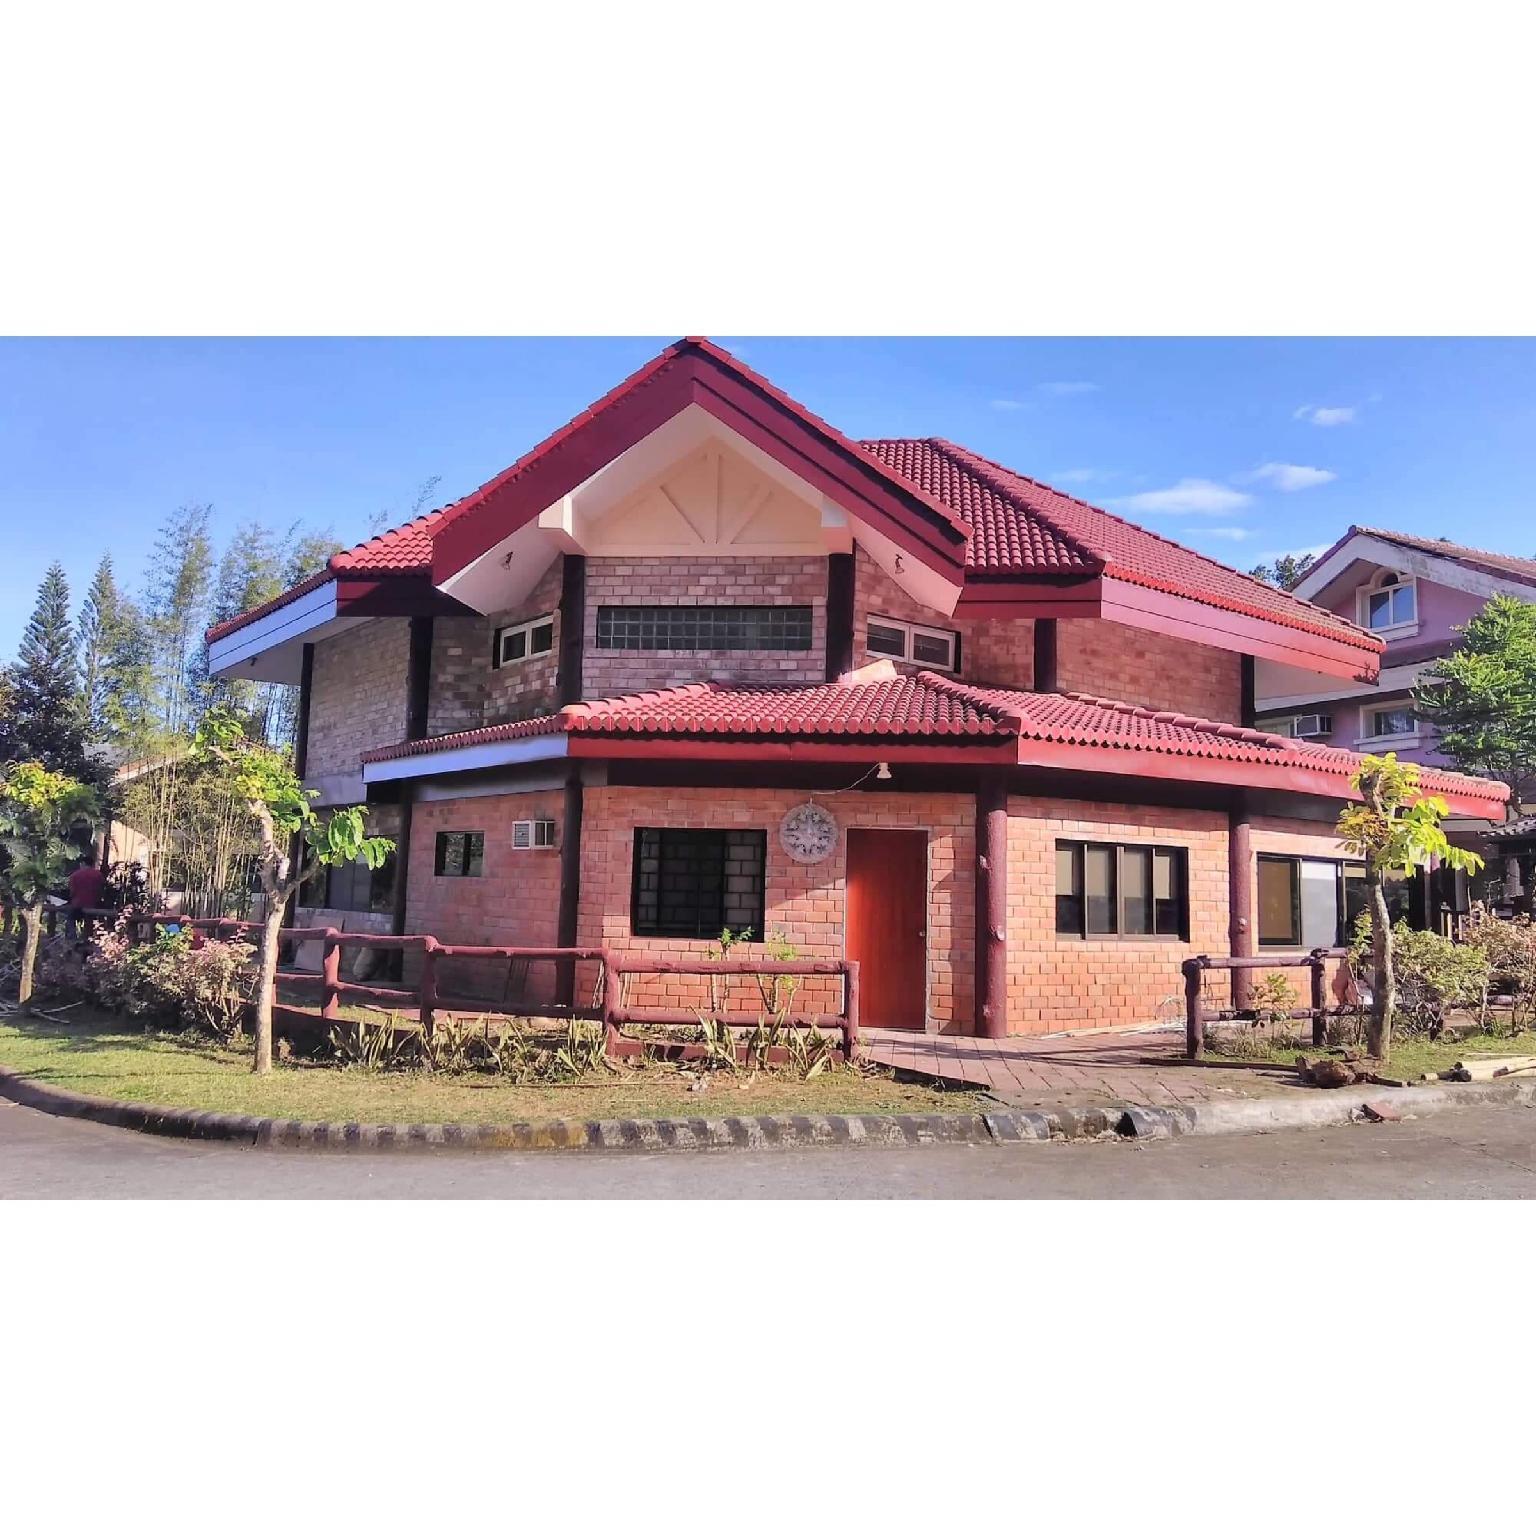 Tagaytay Canyon Woods Brick House